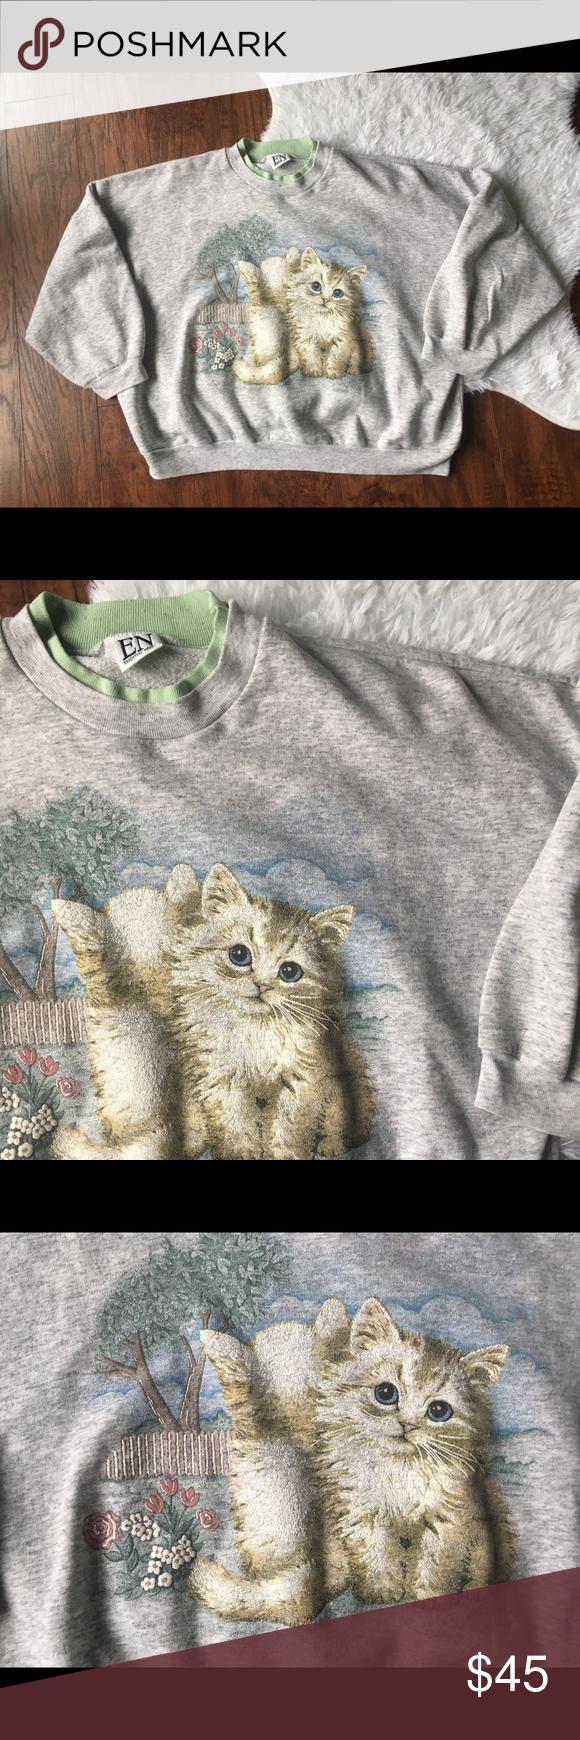 Vintage Crazy Cat Lady Kitten Sweatshirt Sweatshirts Crazy Cat Lady Clothes Design